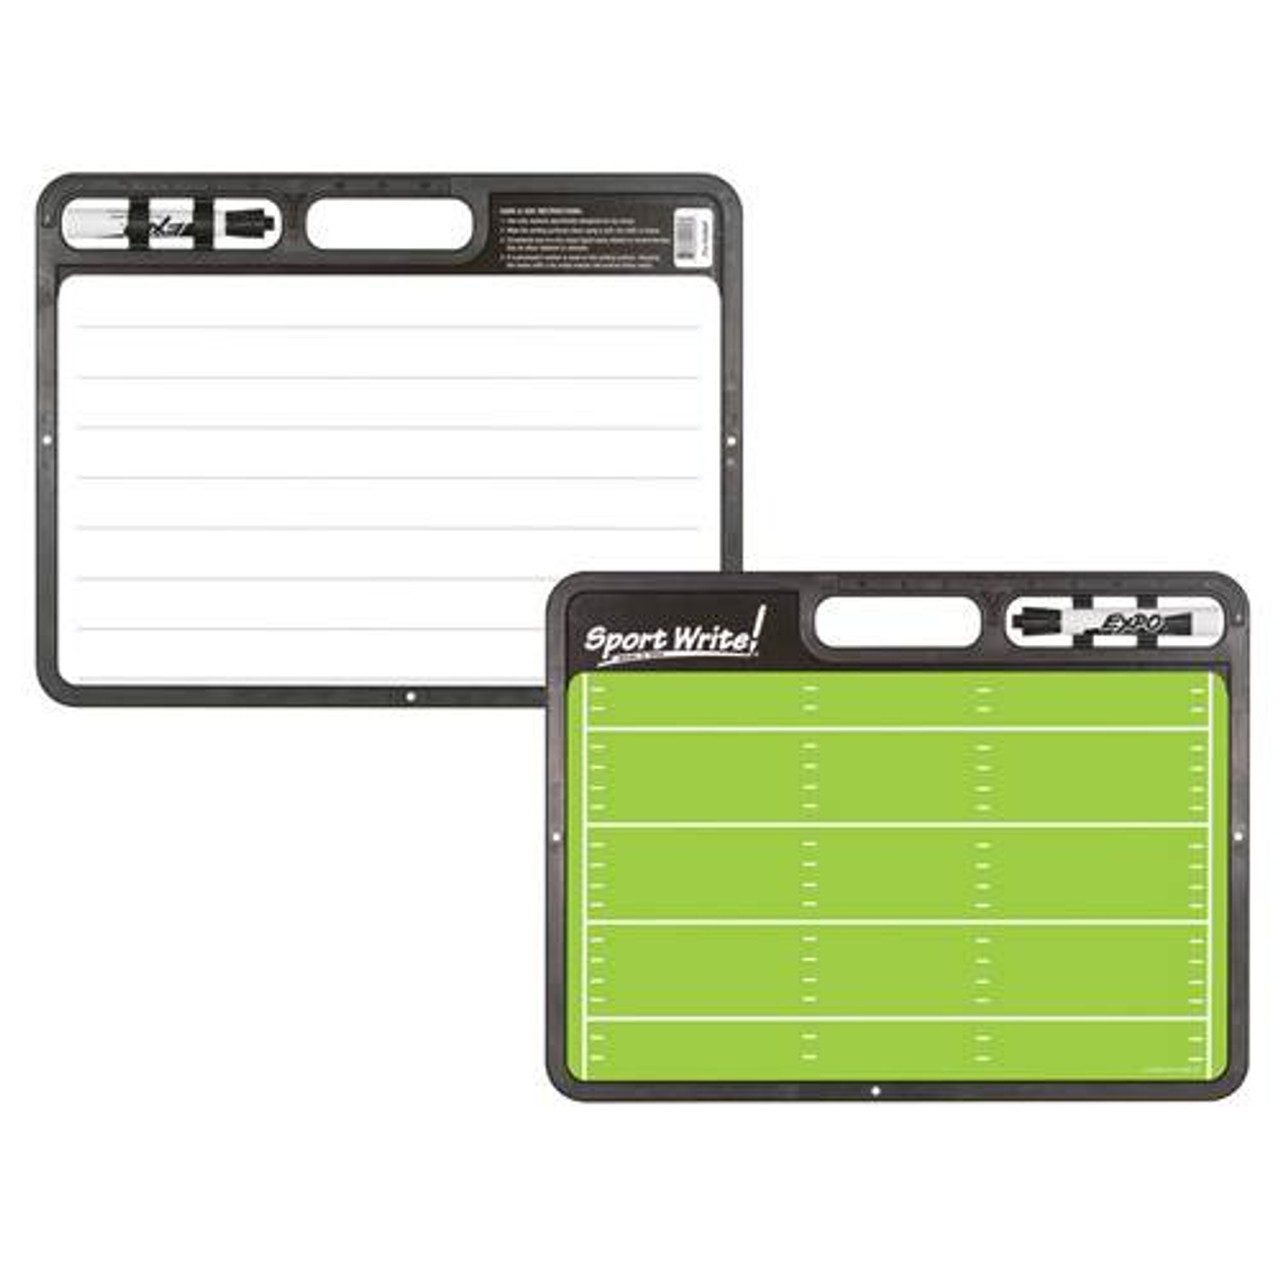 Sport Write Pro Football Dry-Erase Board